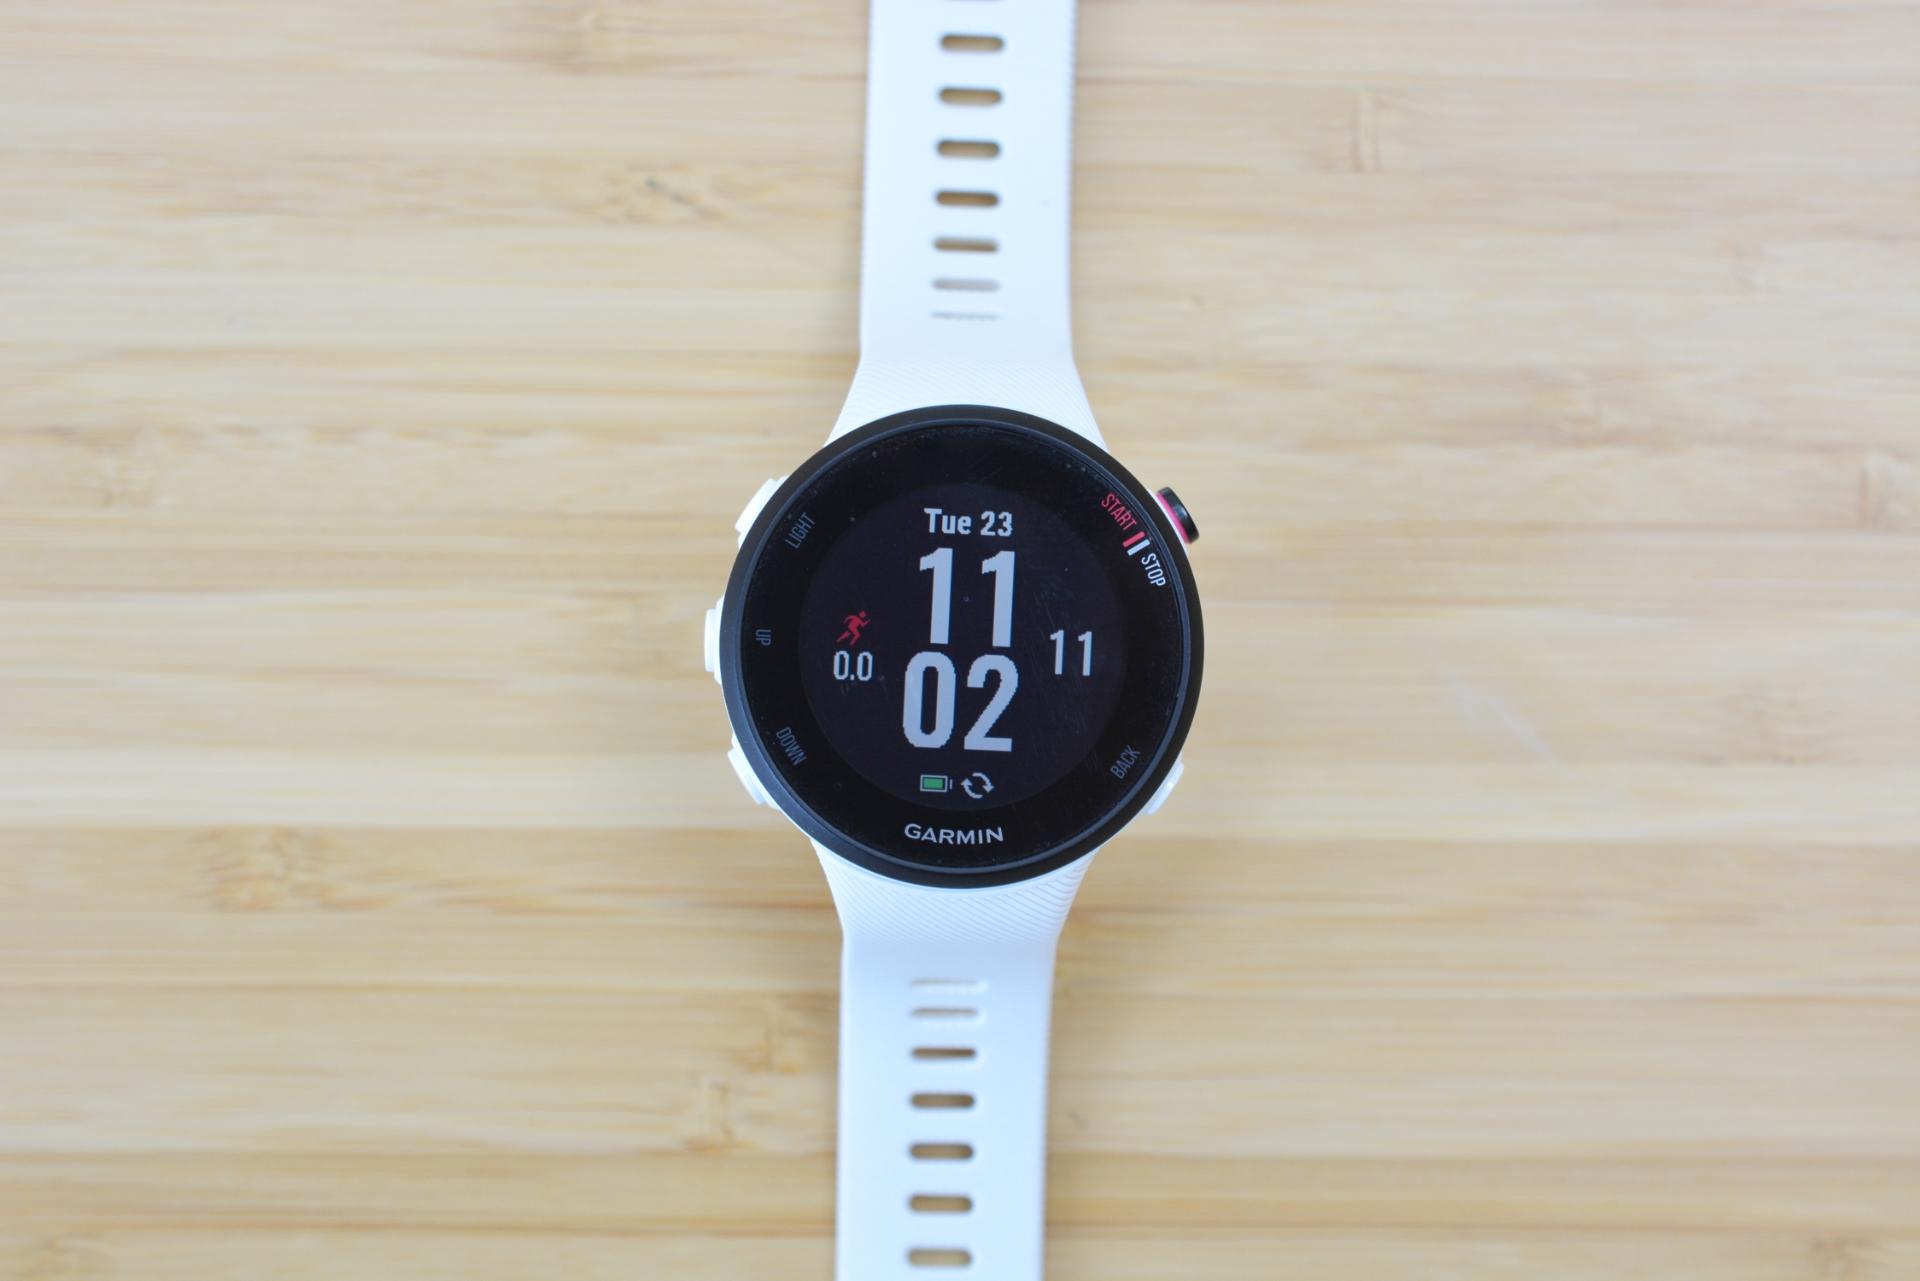 Garmin's Forerunner 45 GPS watch.